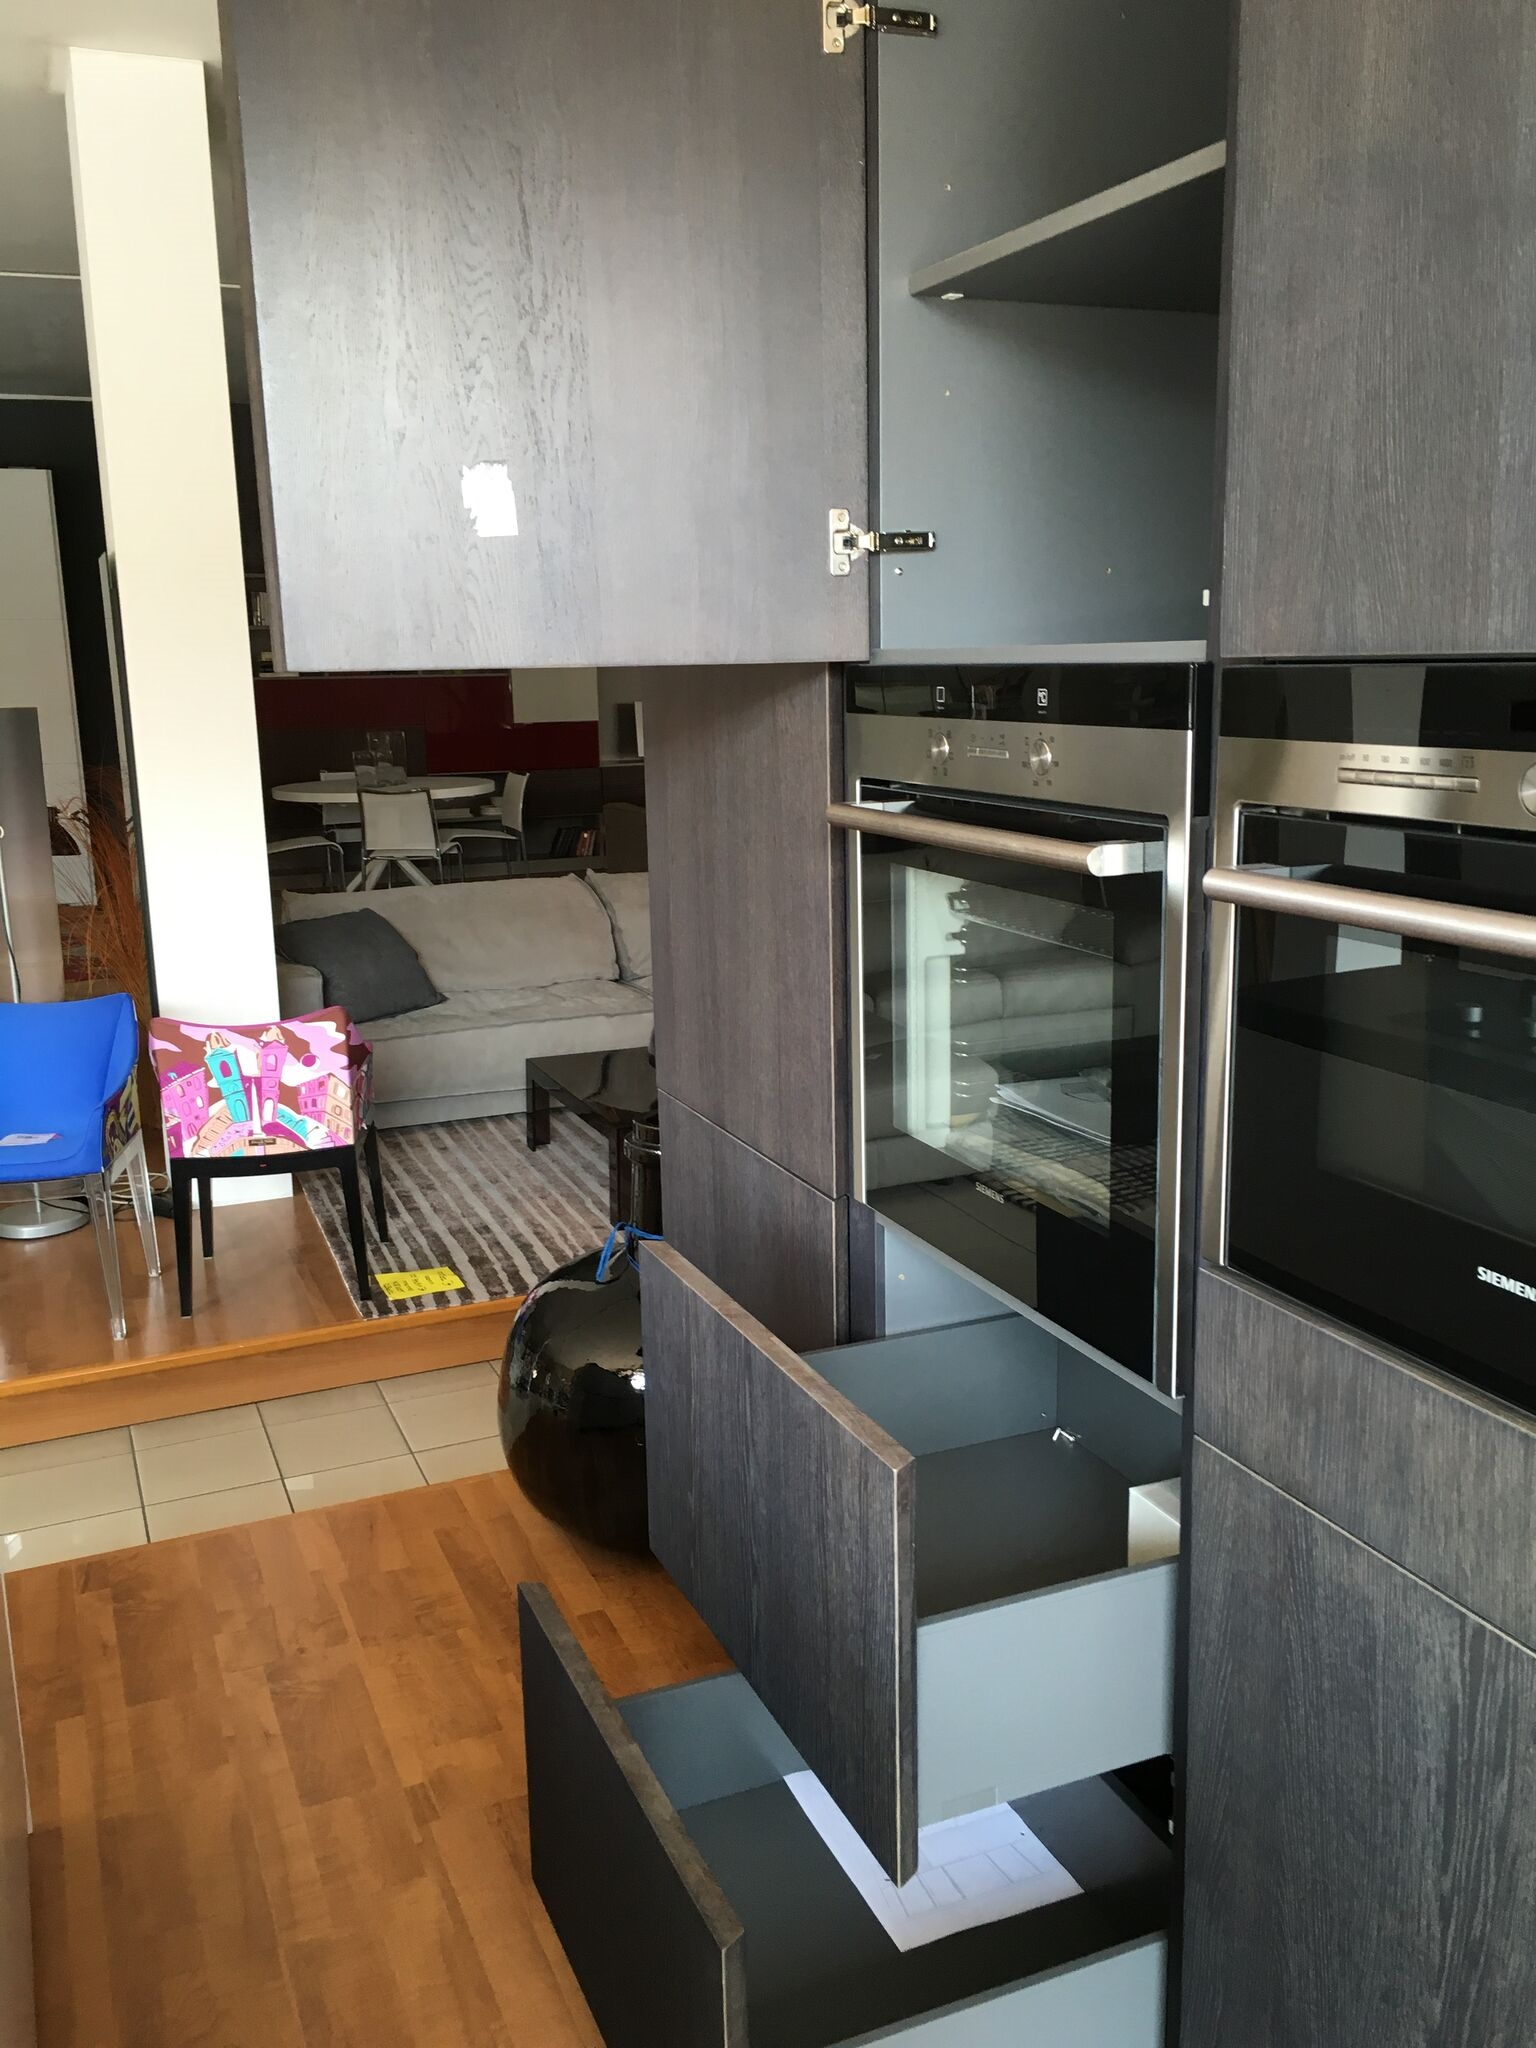 Gm Cucine Prezzi - Idee Per La Casa - Syafir.com